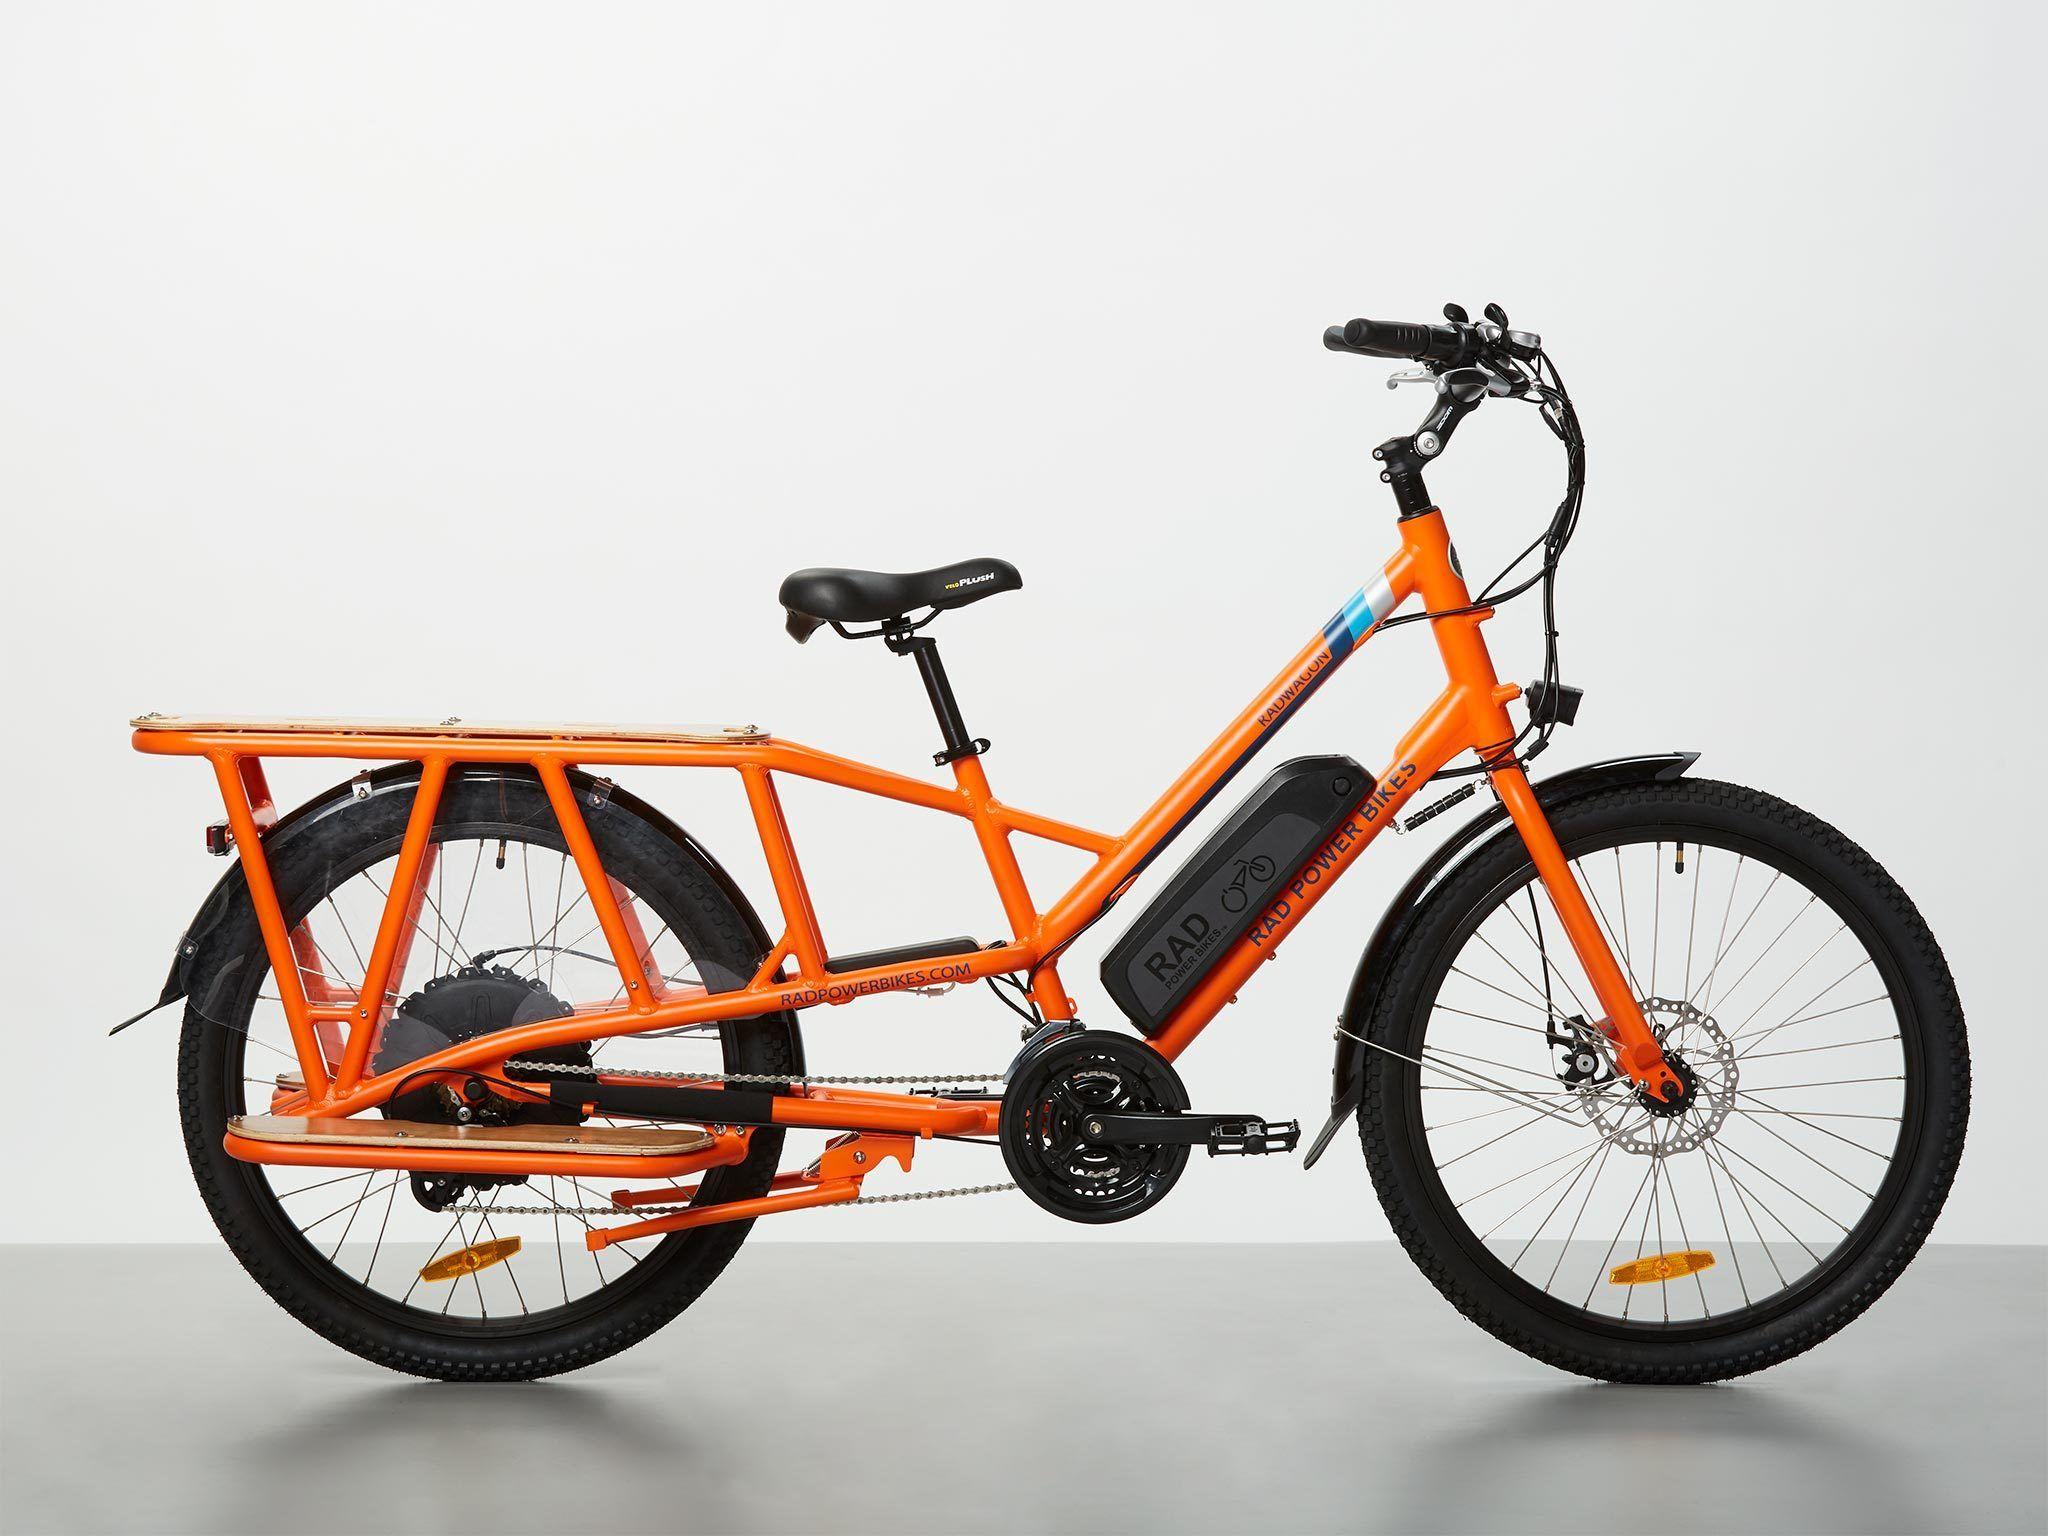 Radwagon Electric Cargo Bike Version 4 Cargo Bike Electric Cargo Bike Power Bike